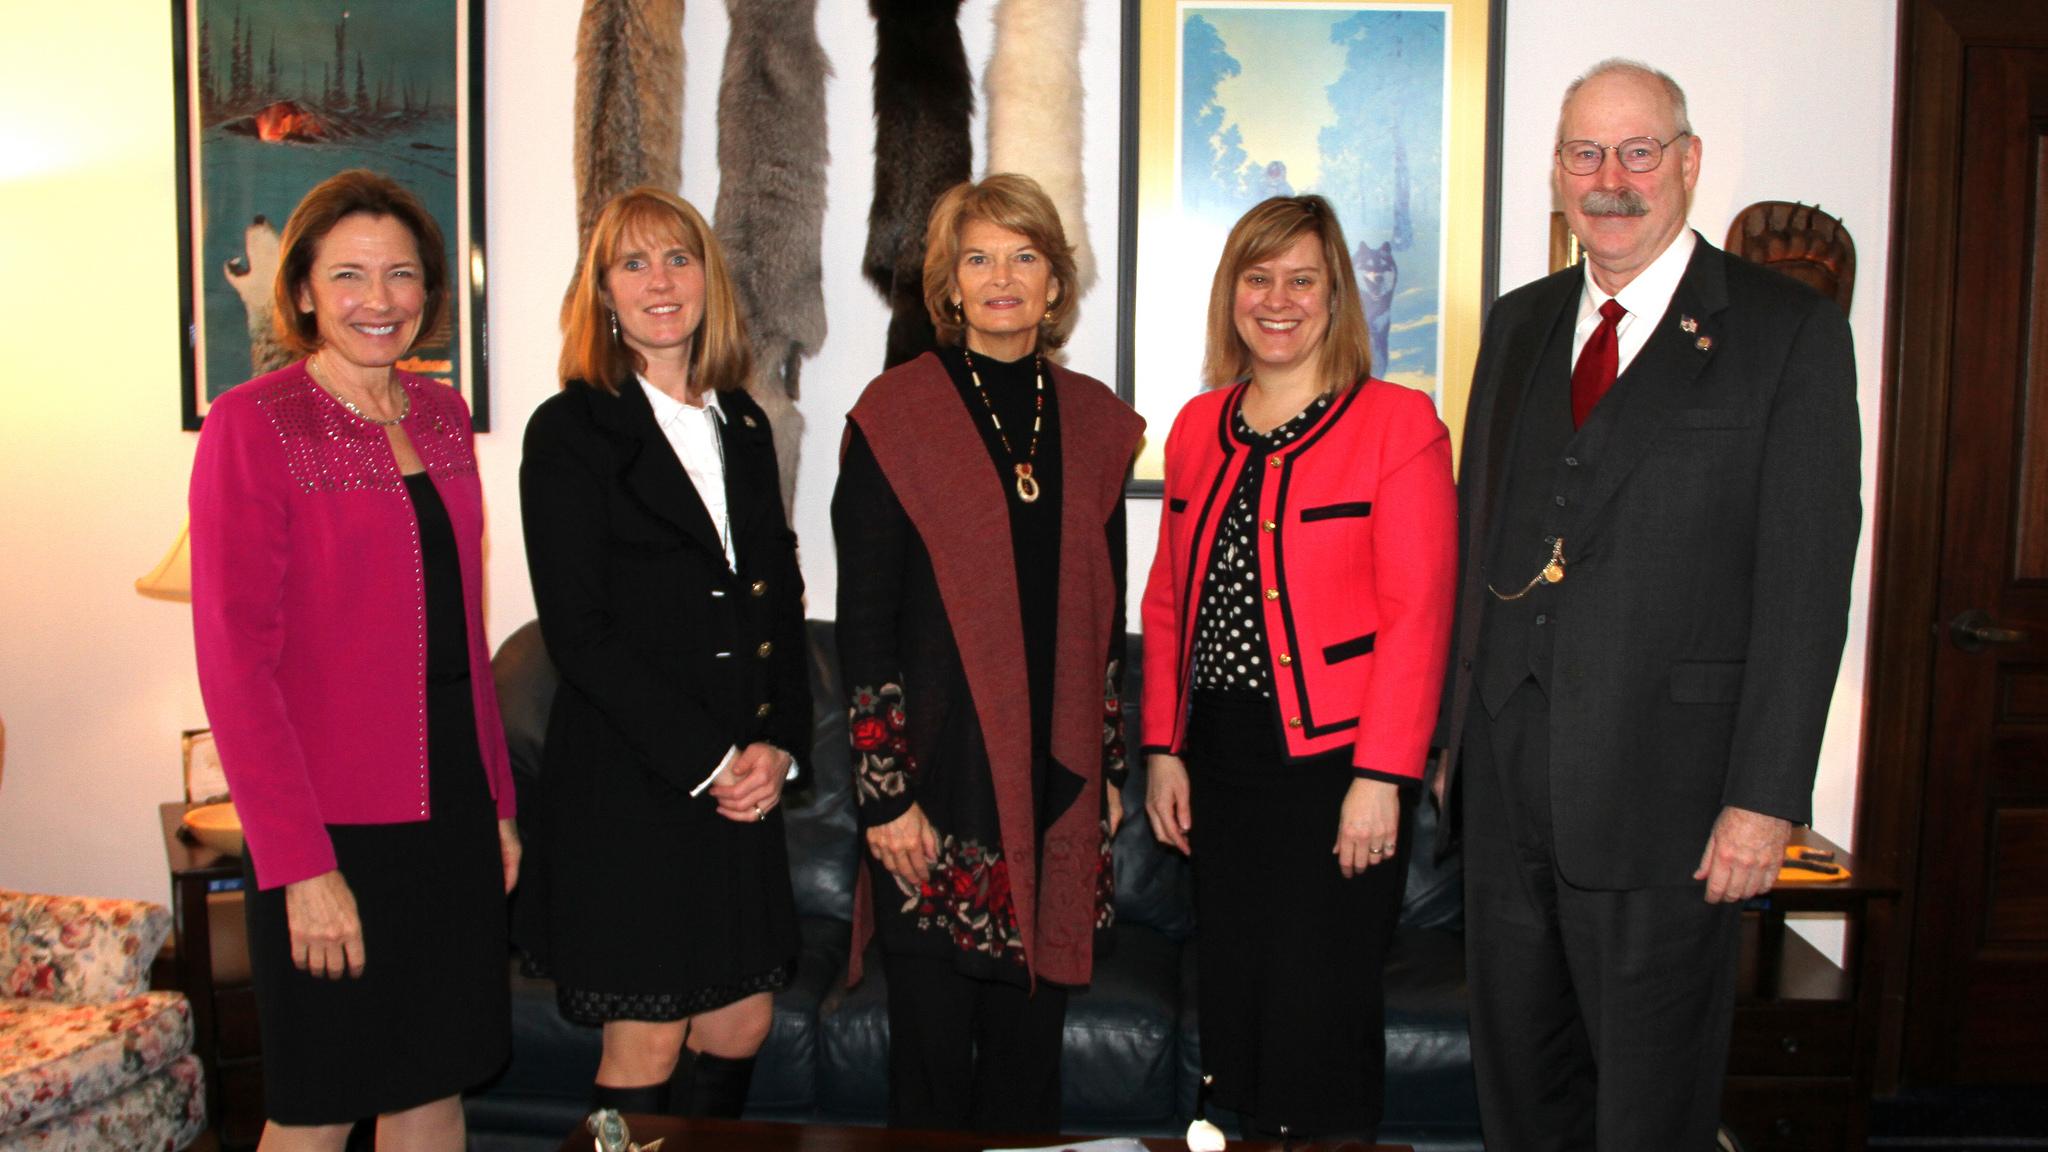 2019 Leadership with Senator Murkowski